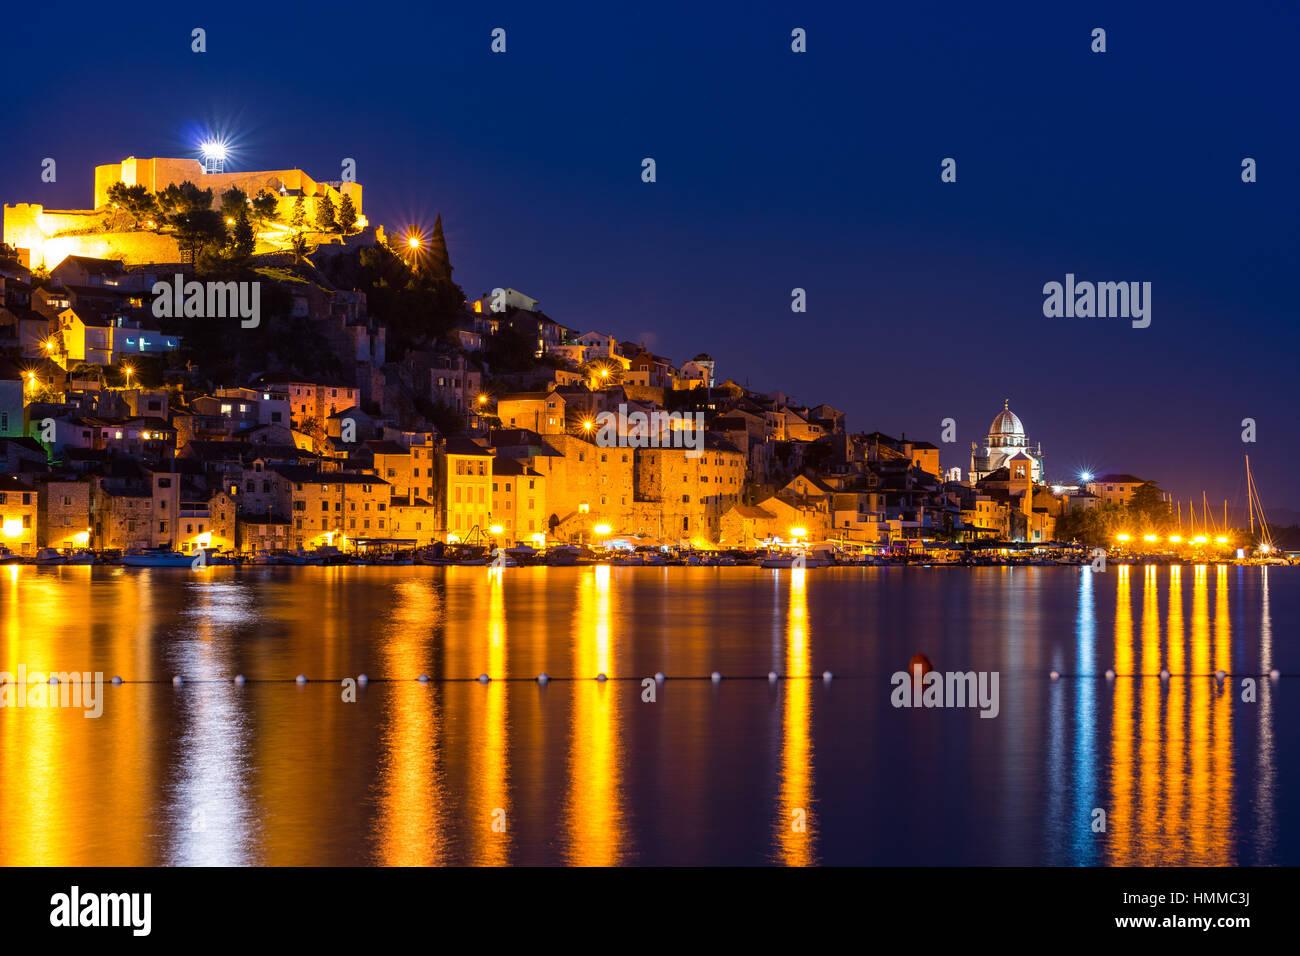 City of Sibenik, Adriatic coast, Croatia - Stock Image